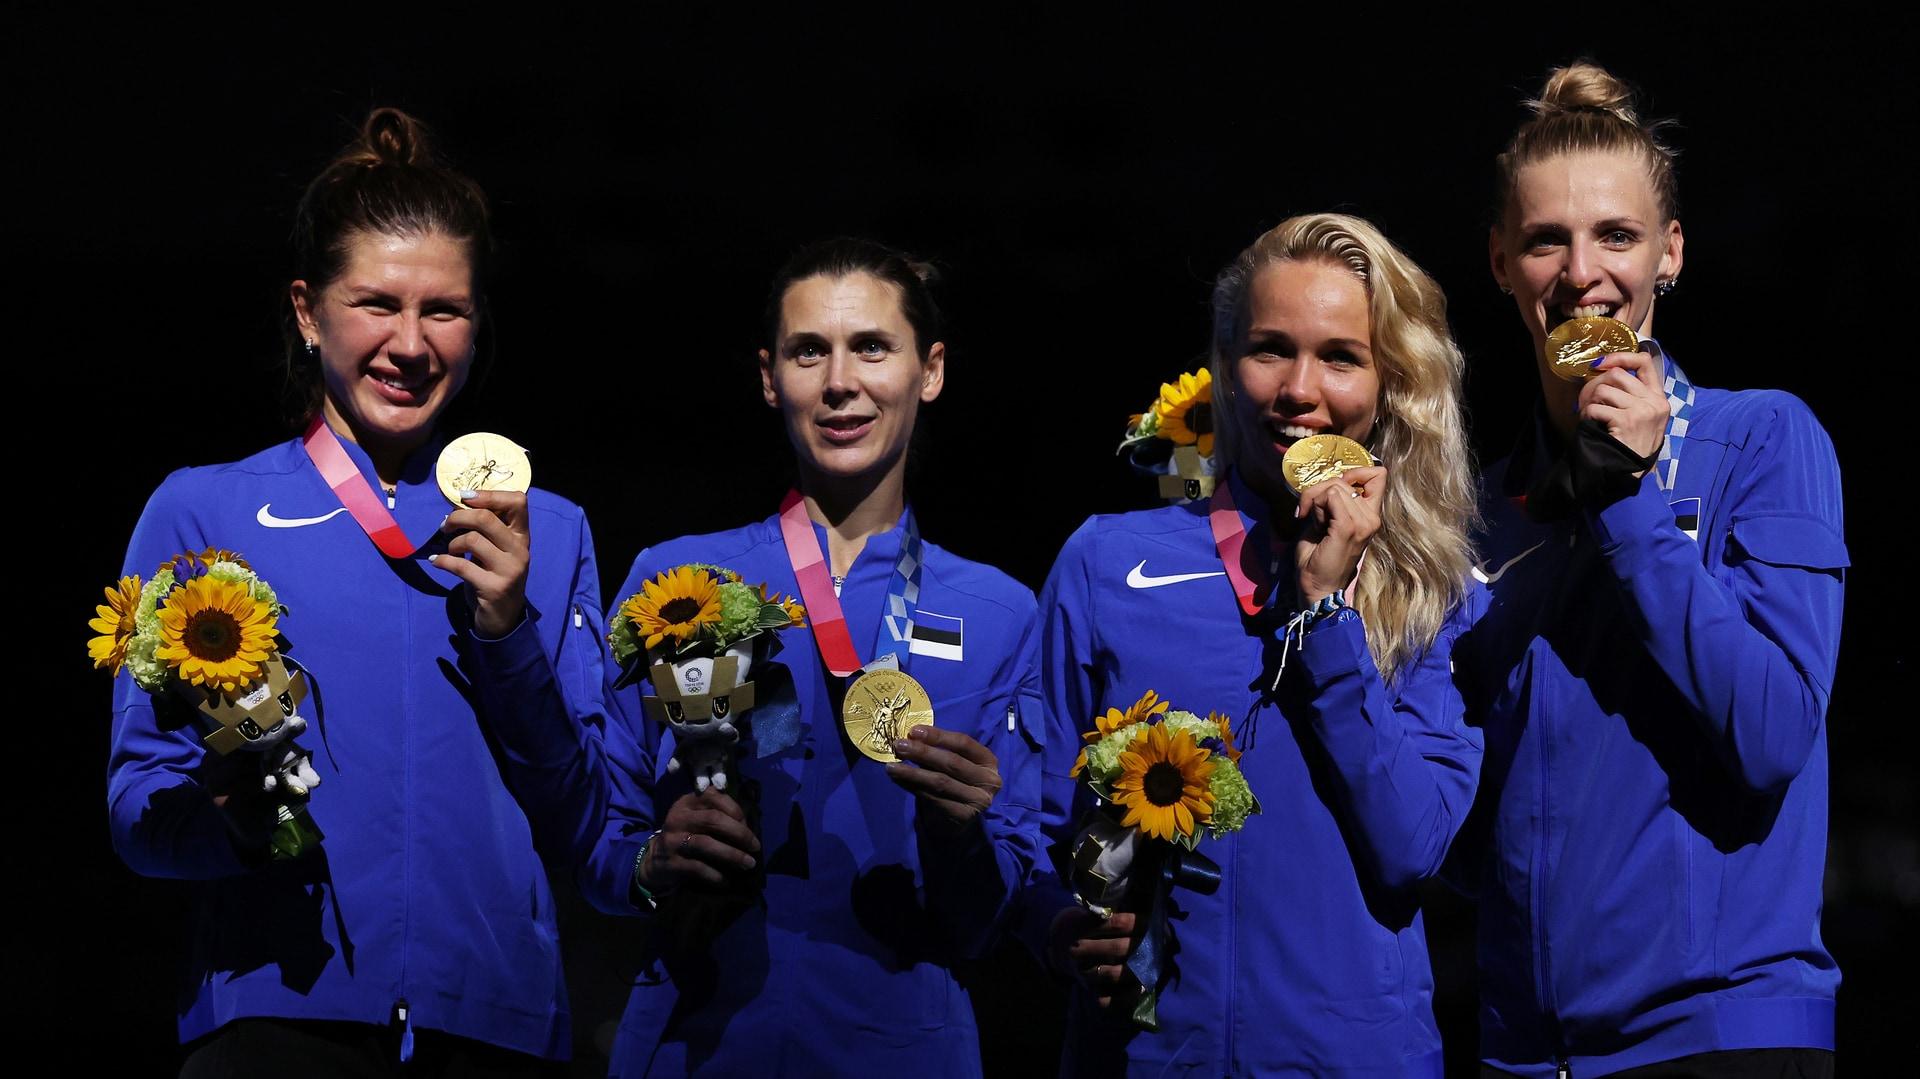 (L-R) Gold medalists Julia Beljajeva, Irina Embrich, Erika Kirpu and Katrina Lehis of Team...